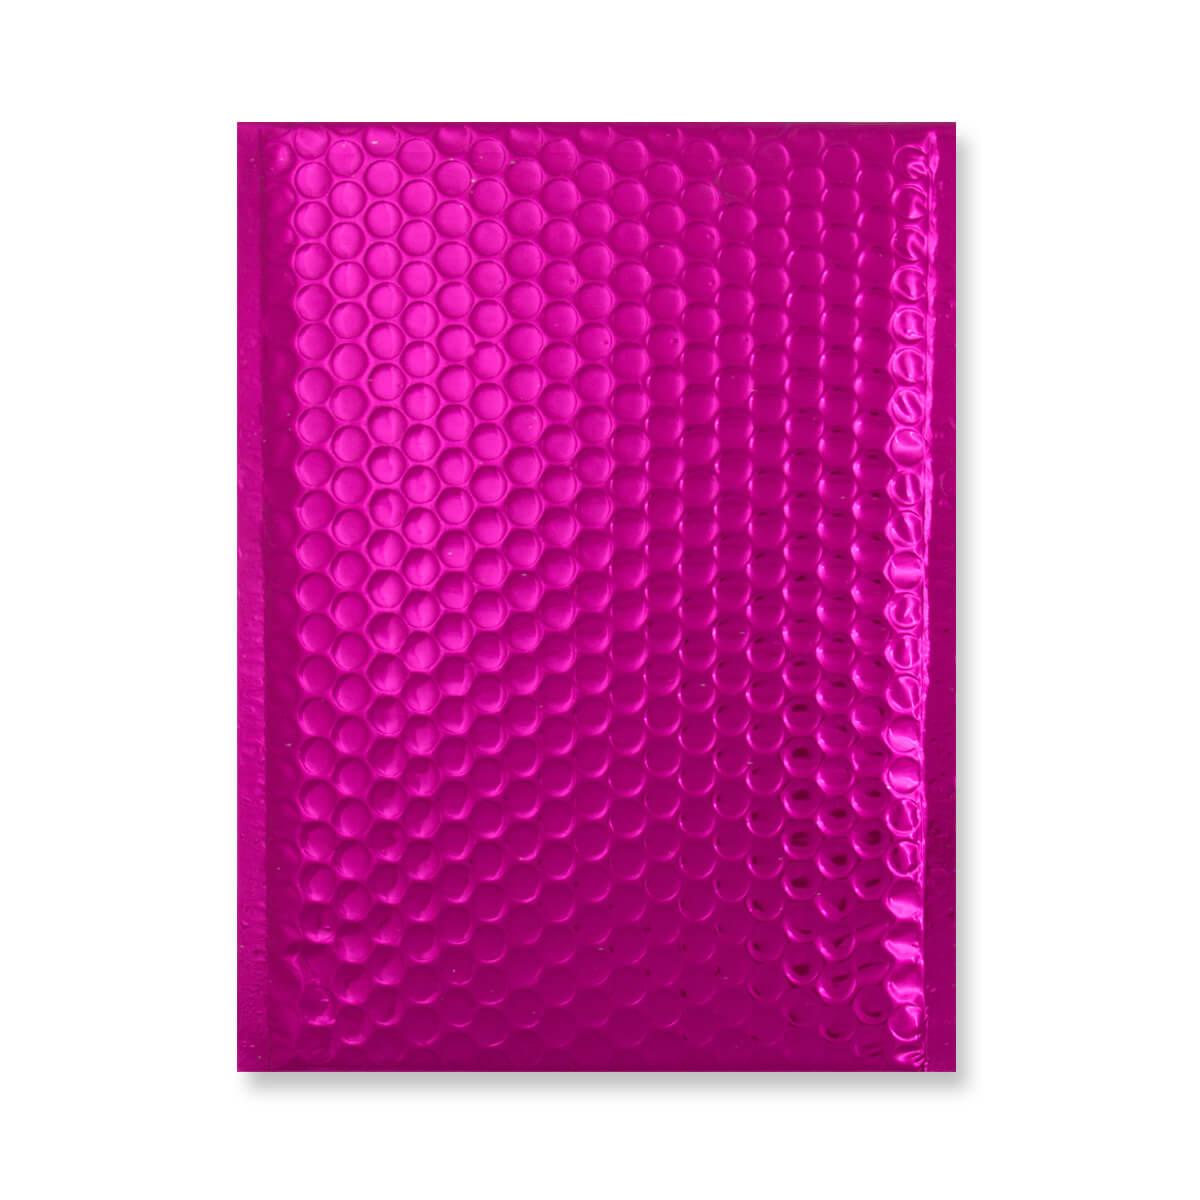 C5 + GLOSS METALLIC HOT PINK PADDED ENVELOPES (250 x 180MM)